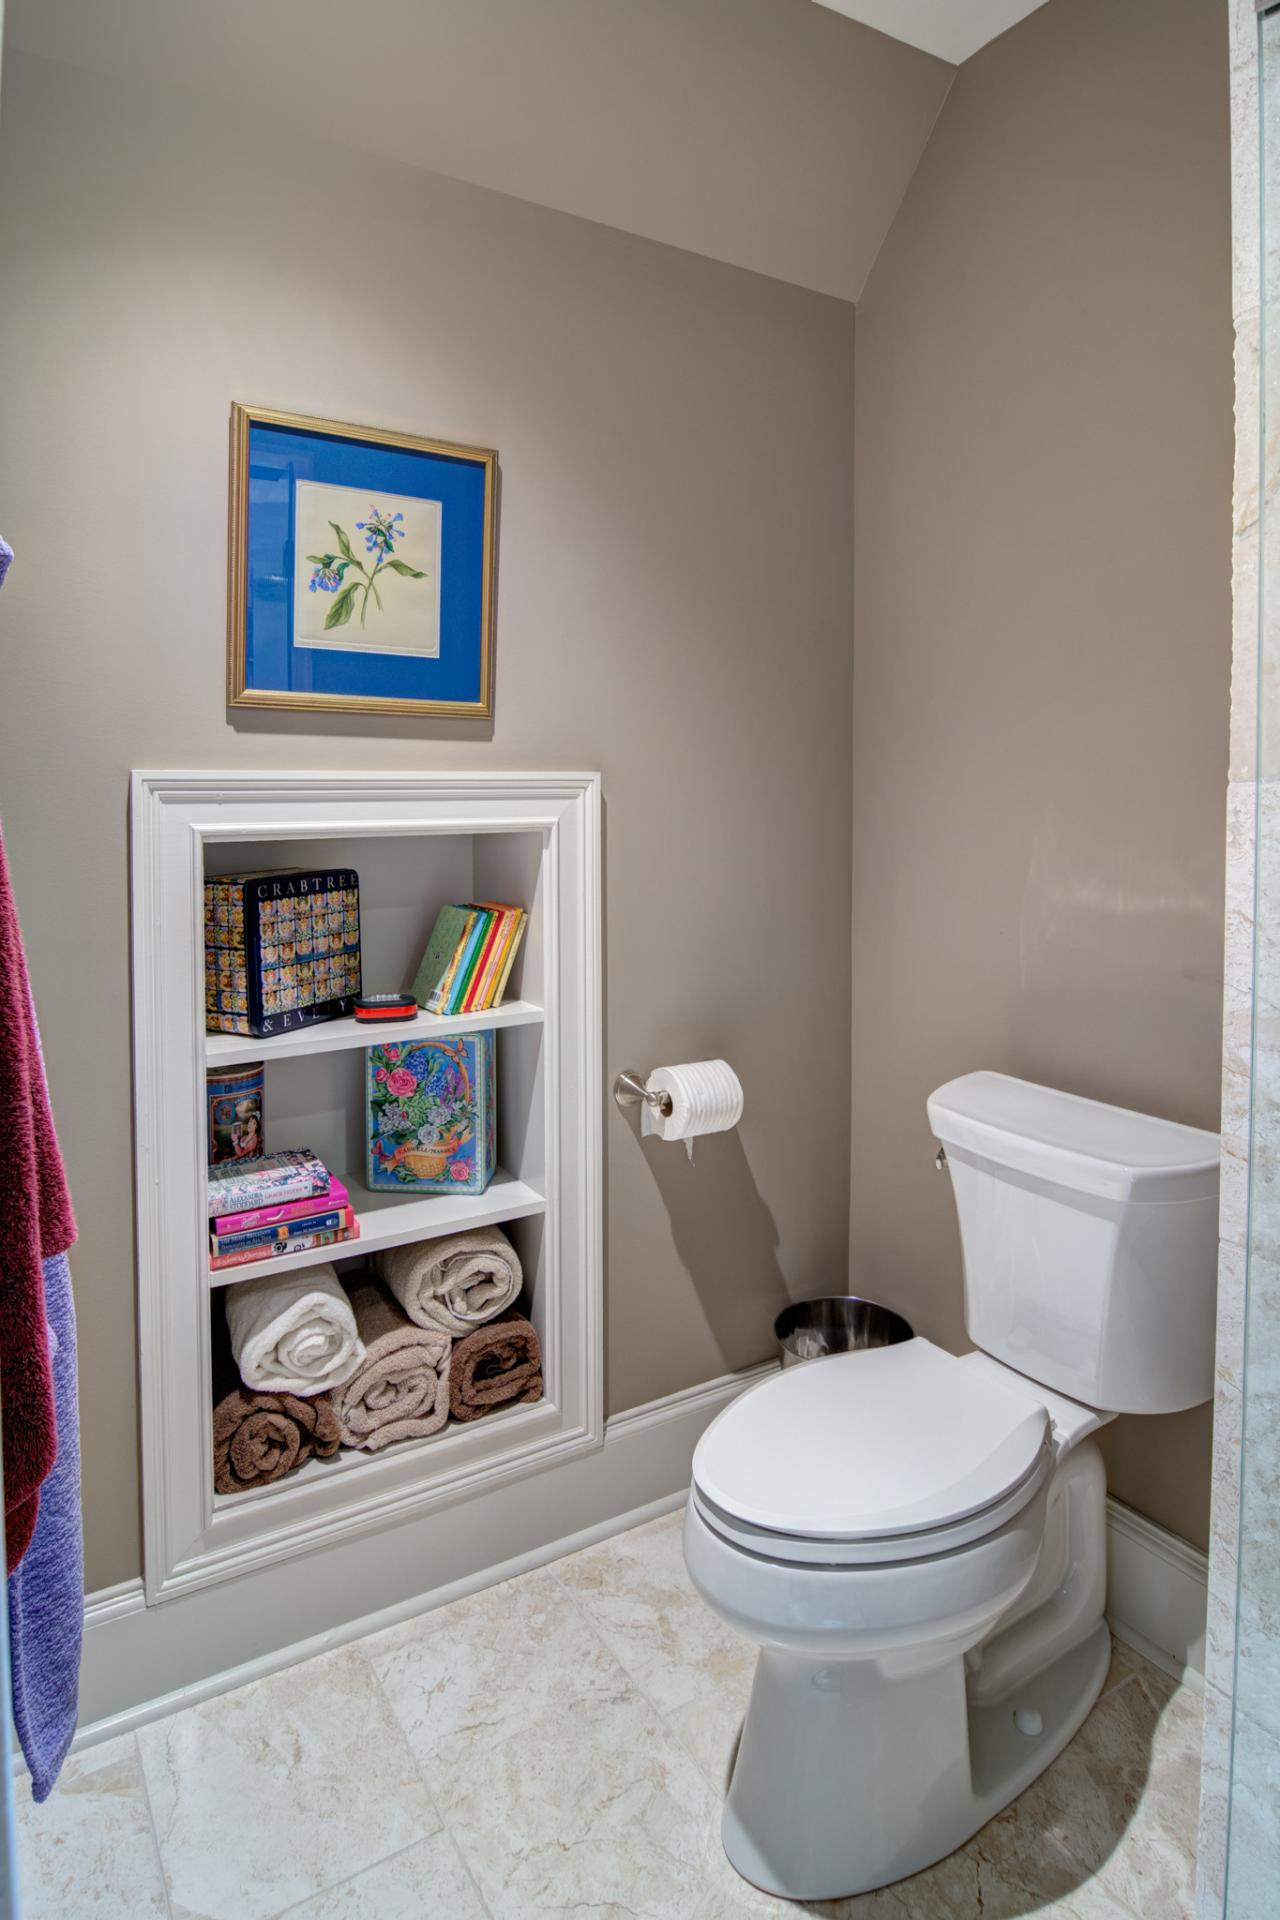 Built in bathroom storage ideas - Built In Storage Bathroom Storage Ideas